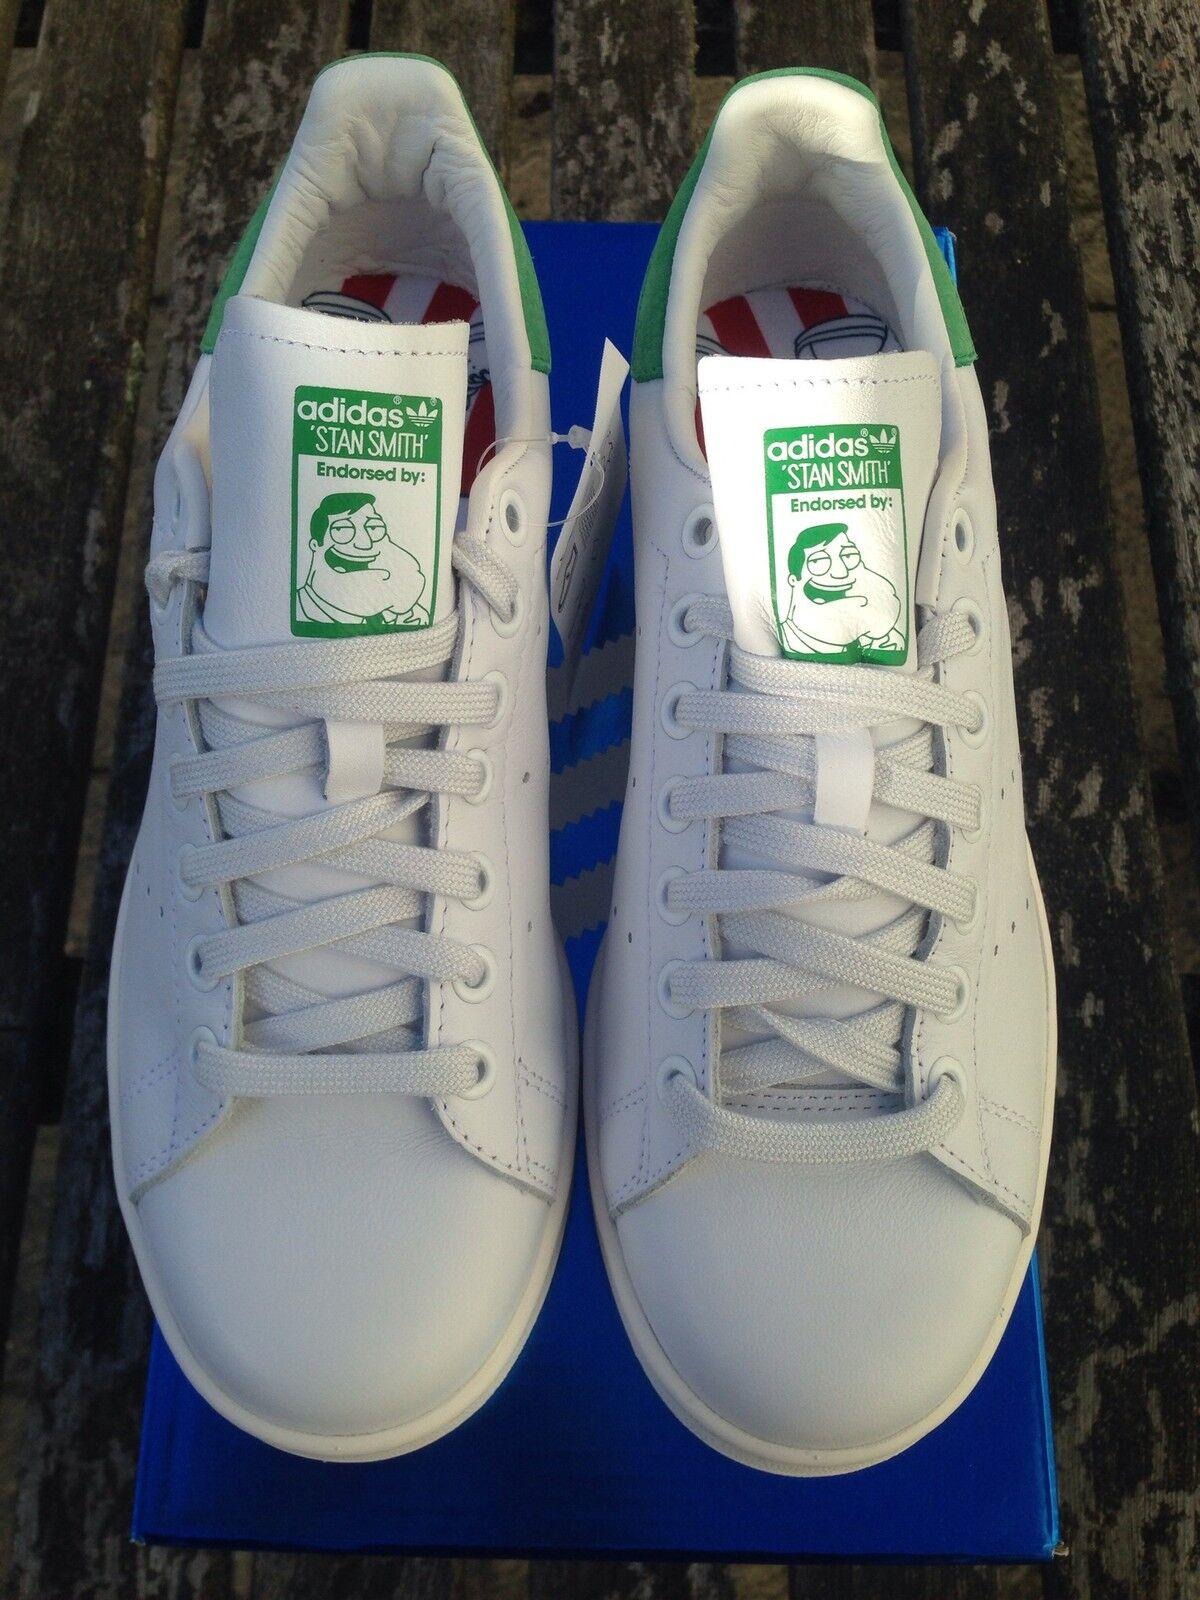 Adidas Stan Smith Originals x STAN SMITH